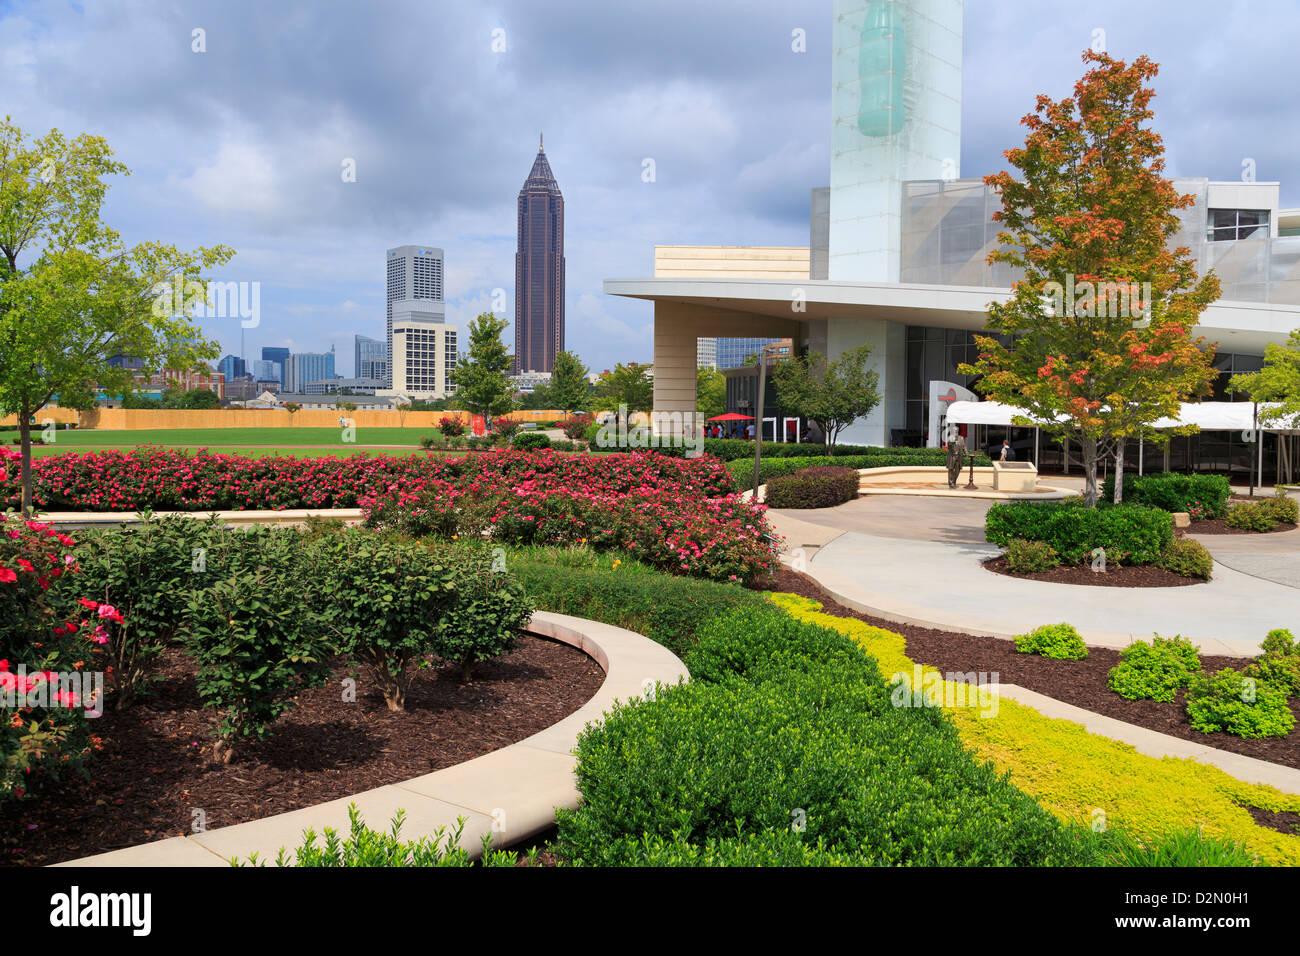 World of Coca Cola in Pemberton Park, Atlanta, Georgia, United States of America, North America - Stock Image